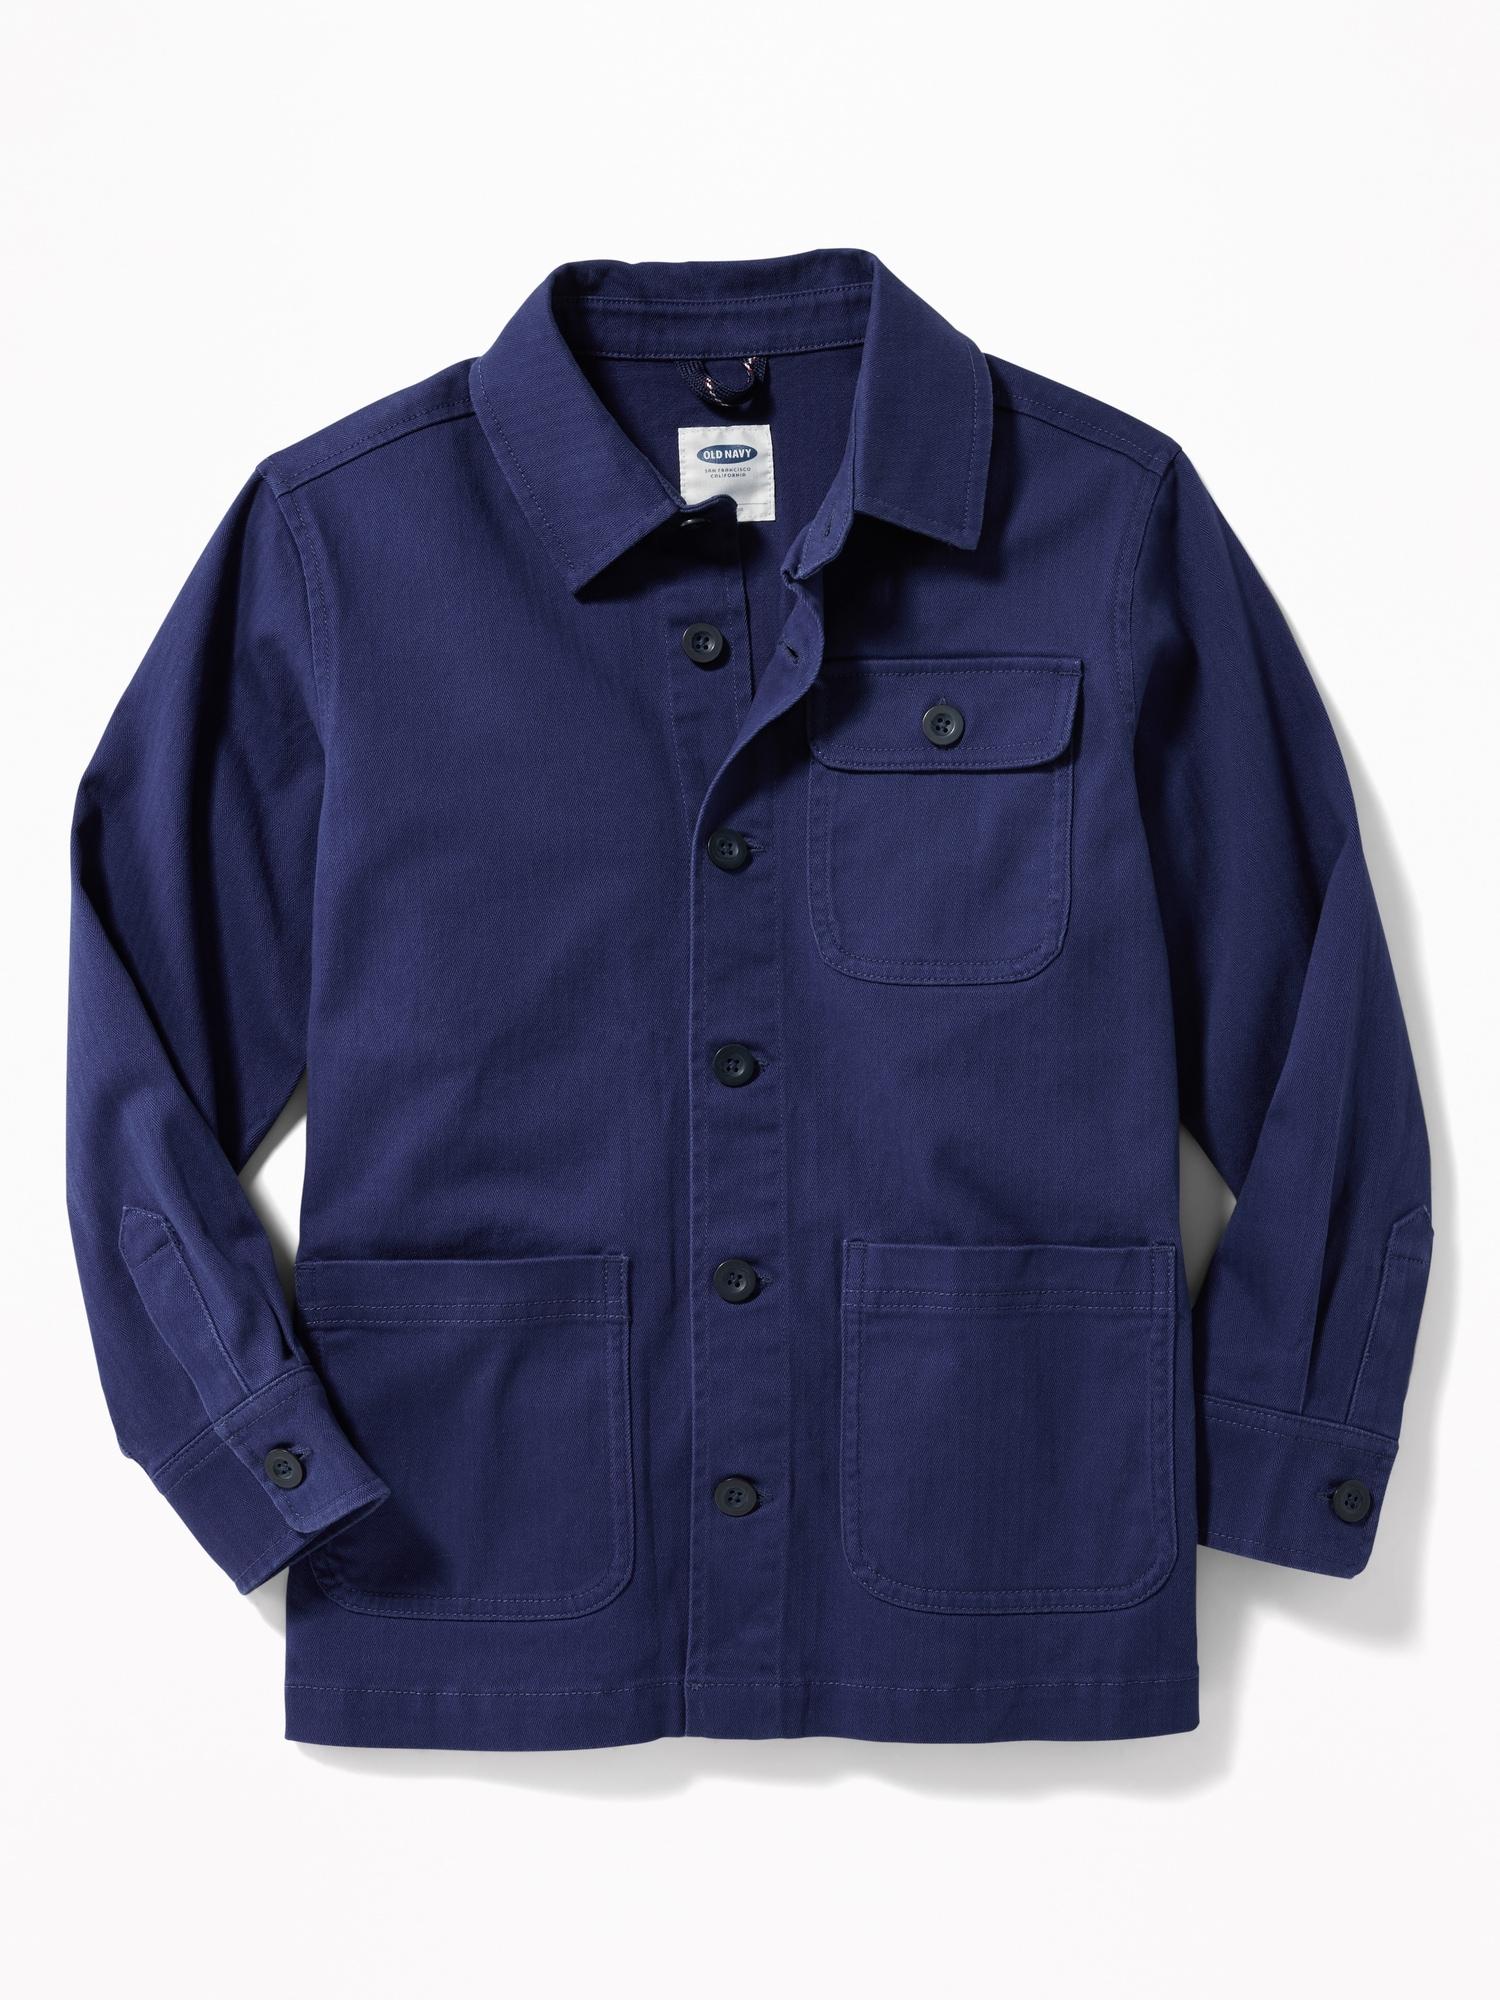 fb9a7bdb22b3 Built-In Flex Chore Jacket for Boys